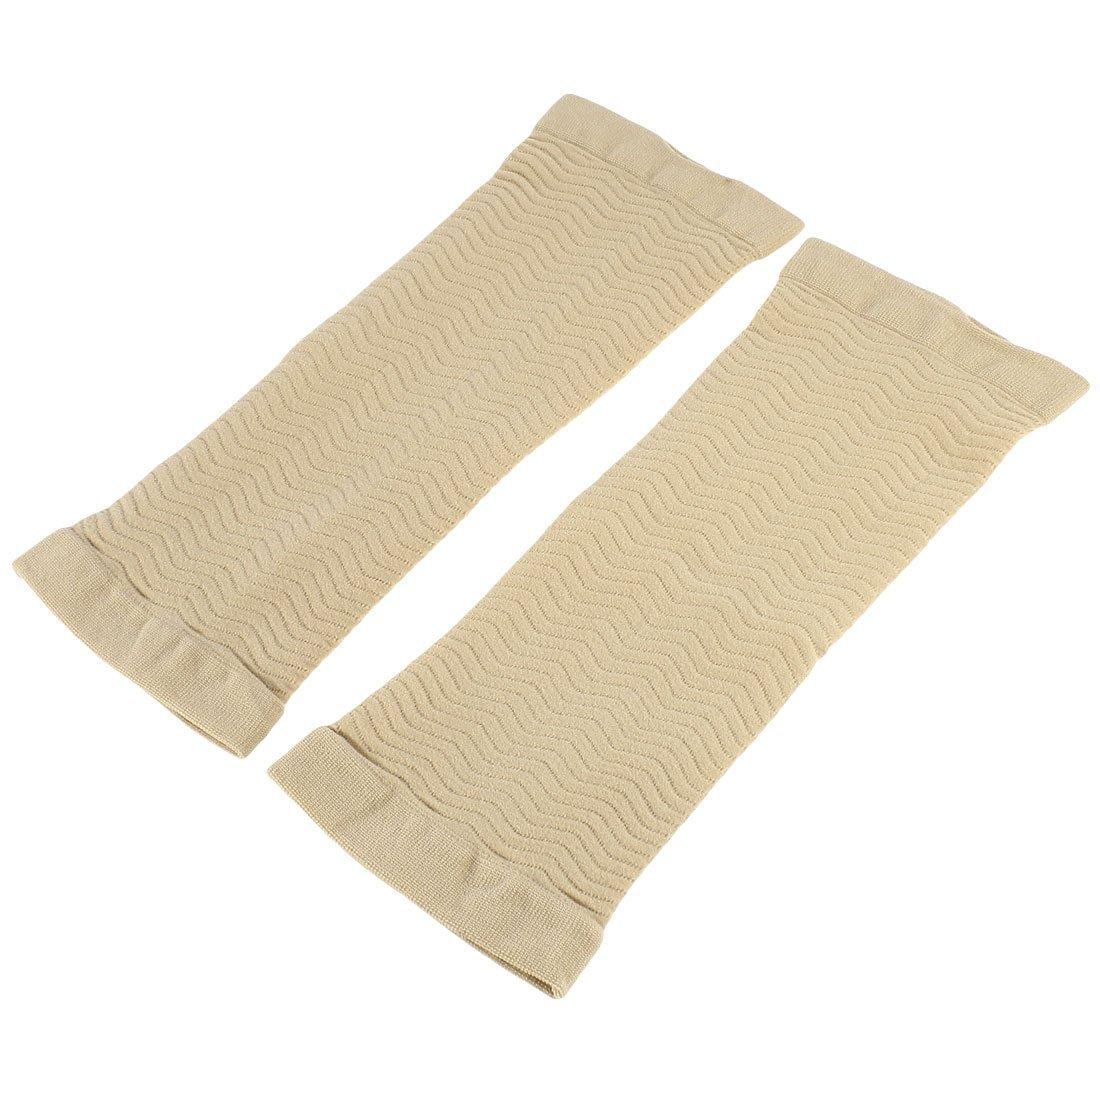 uxcell Pair Khaki Wave Texture Elastic Upper Arm Massage Shaper